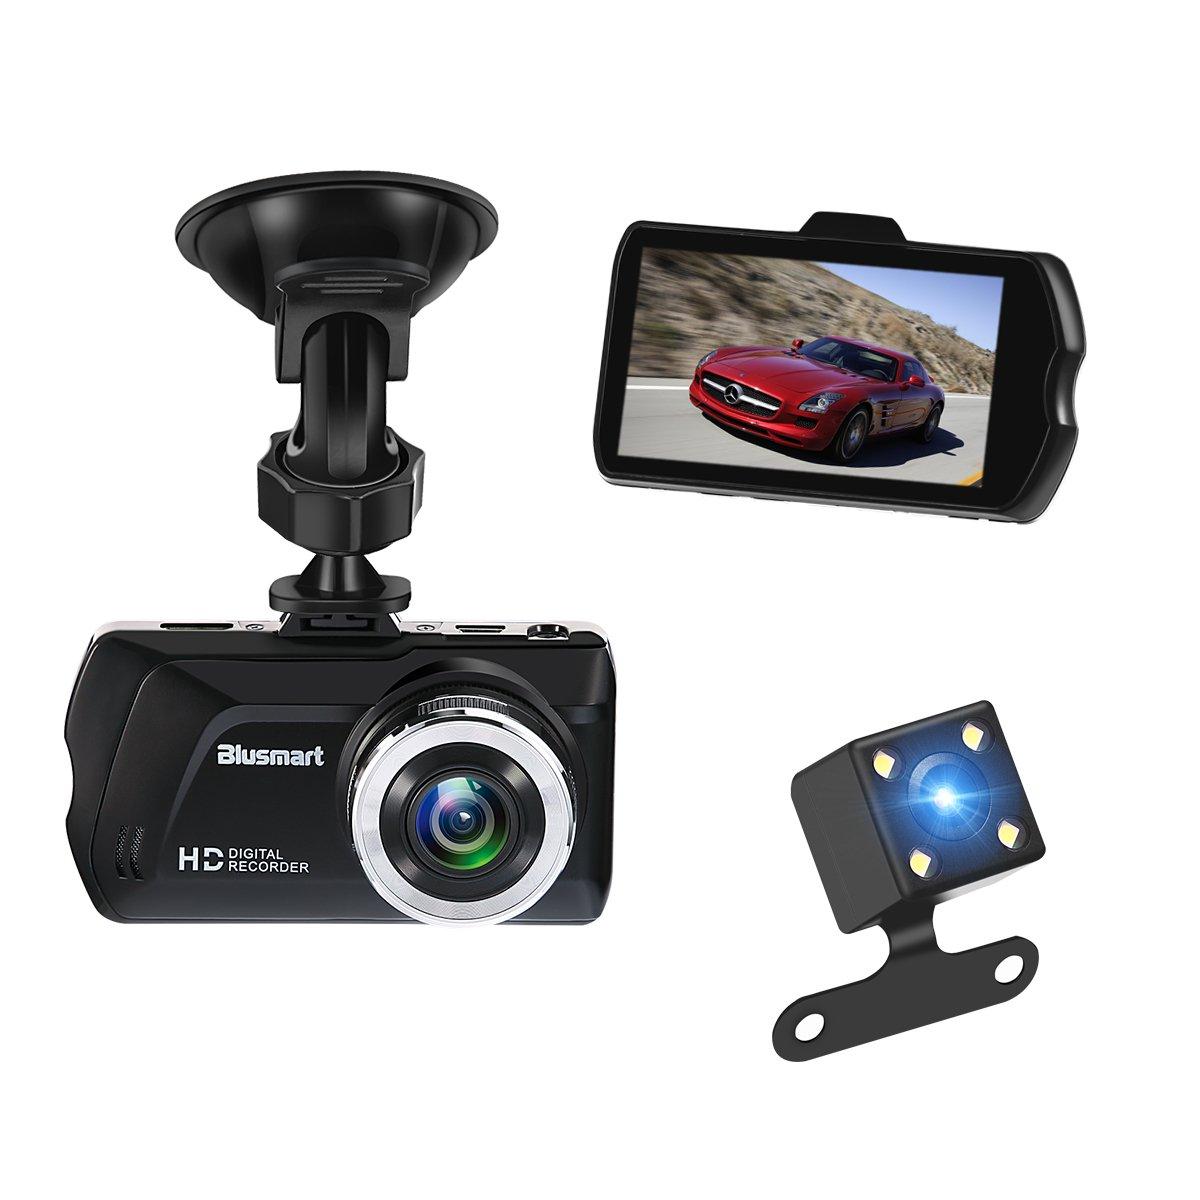 Blusmart 170° weitwinkel Kamera Video Kanal für Rückfahrkamera